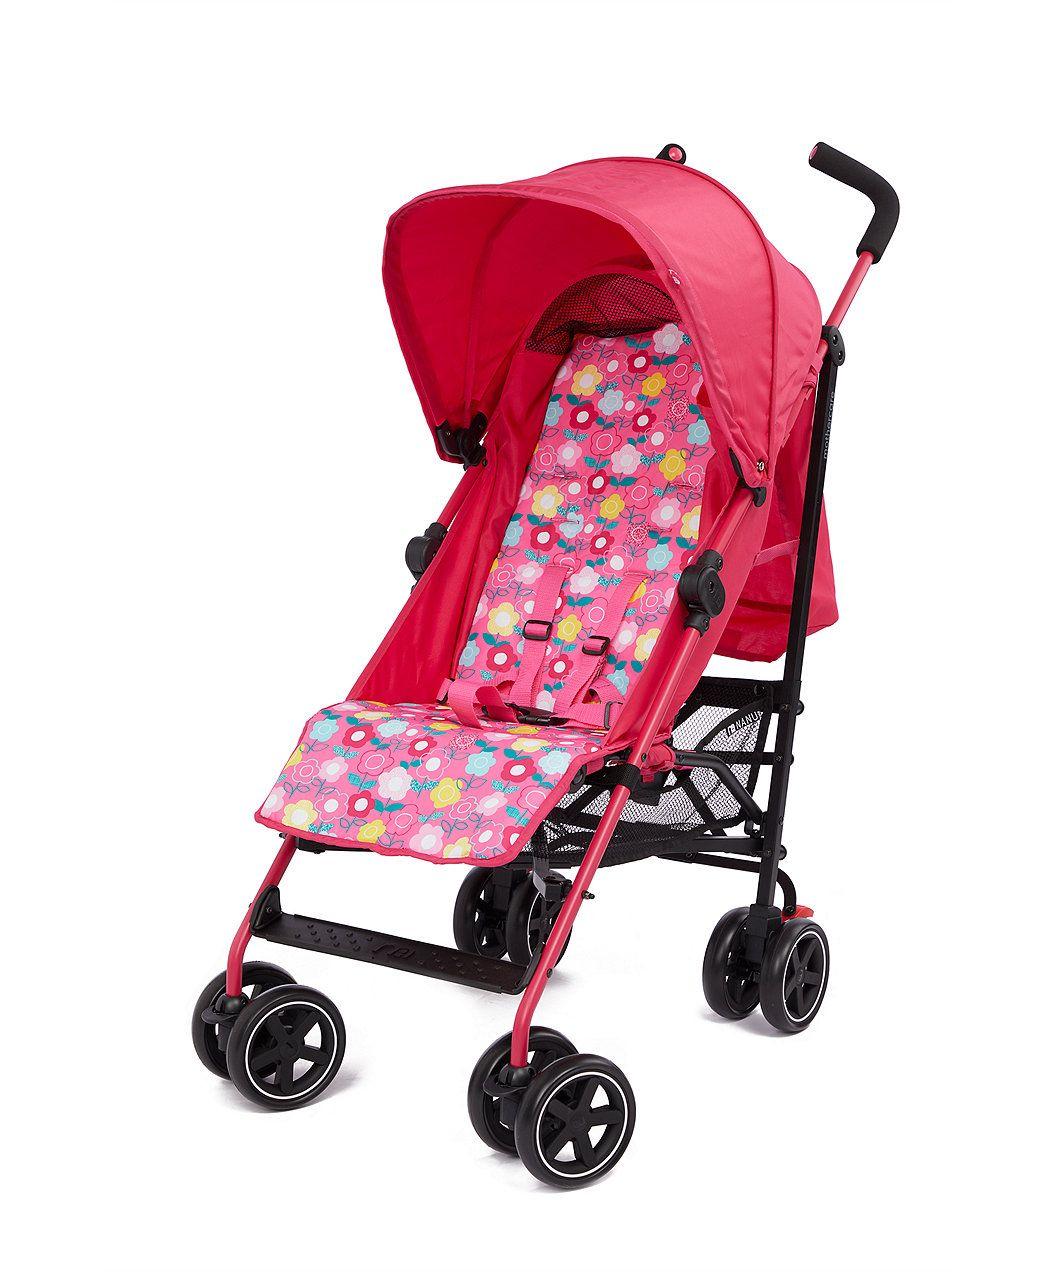 Mothercare Nanu Stroller Pink Daisy €79.99 Stroller